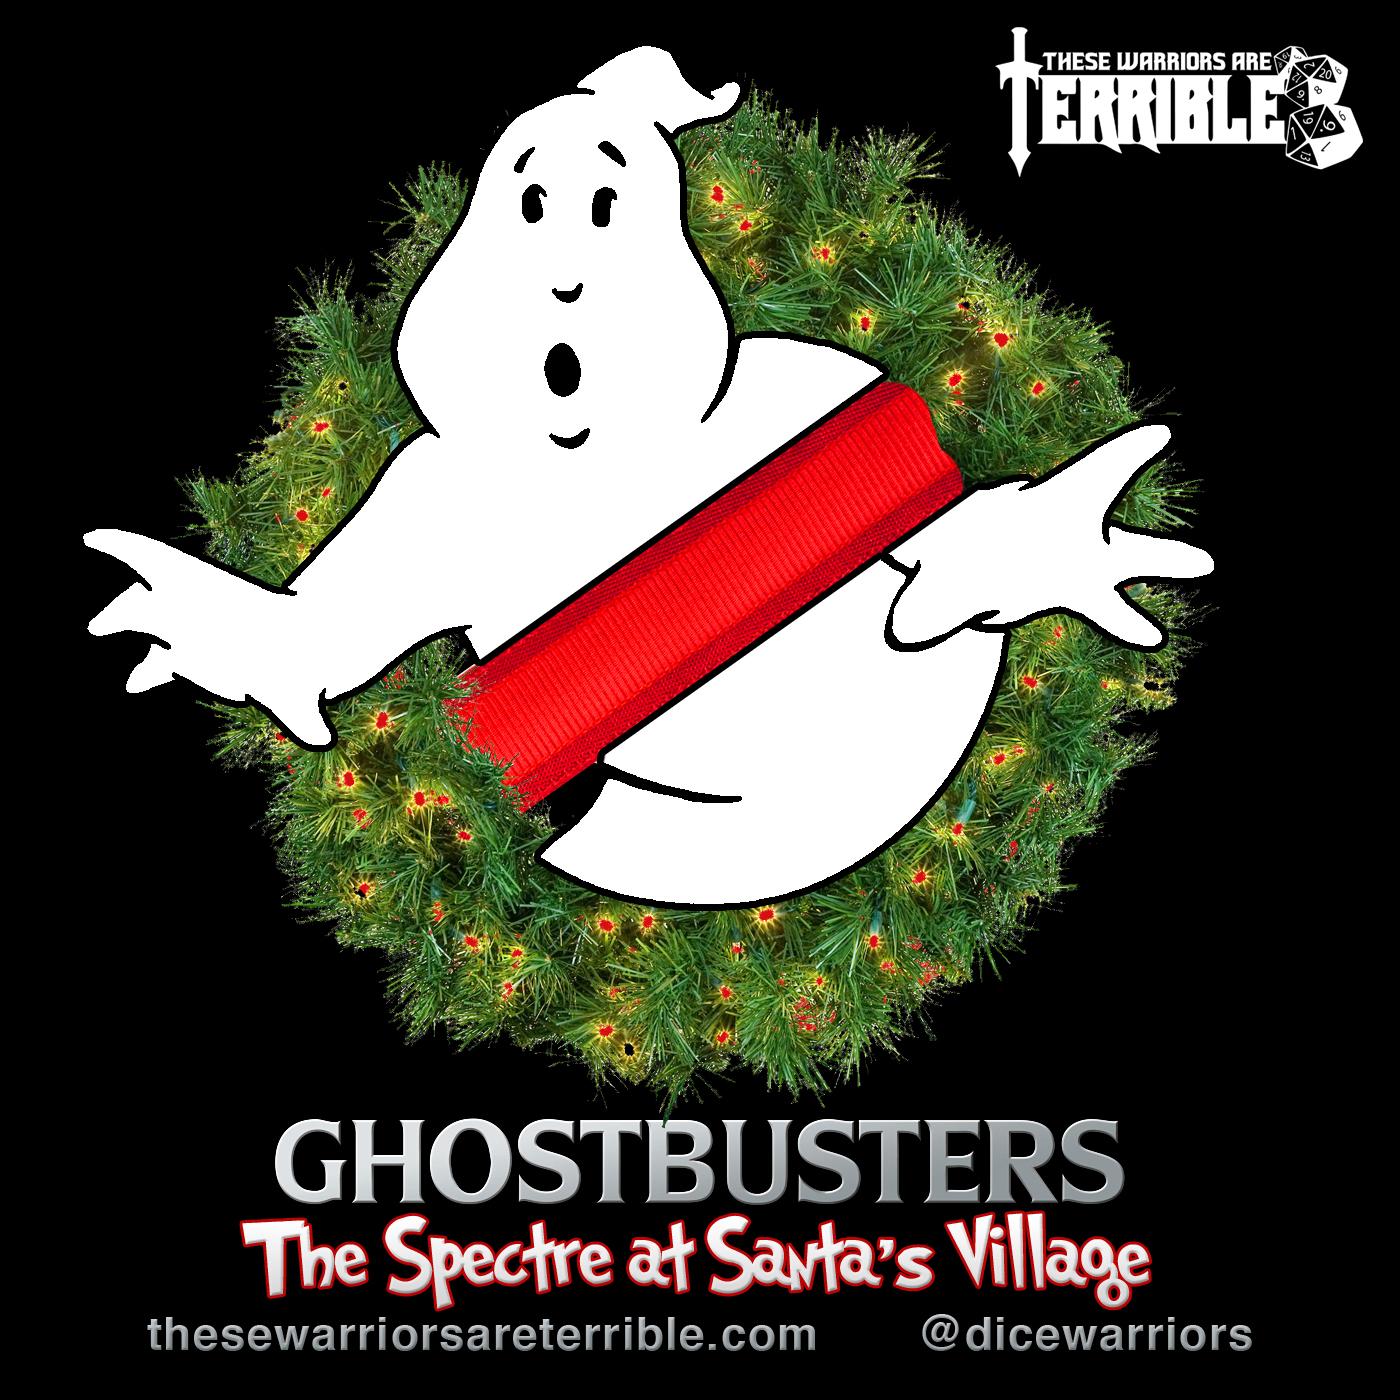 Ghostbusters-AlbumArt300x300